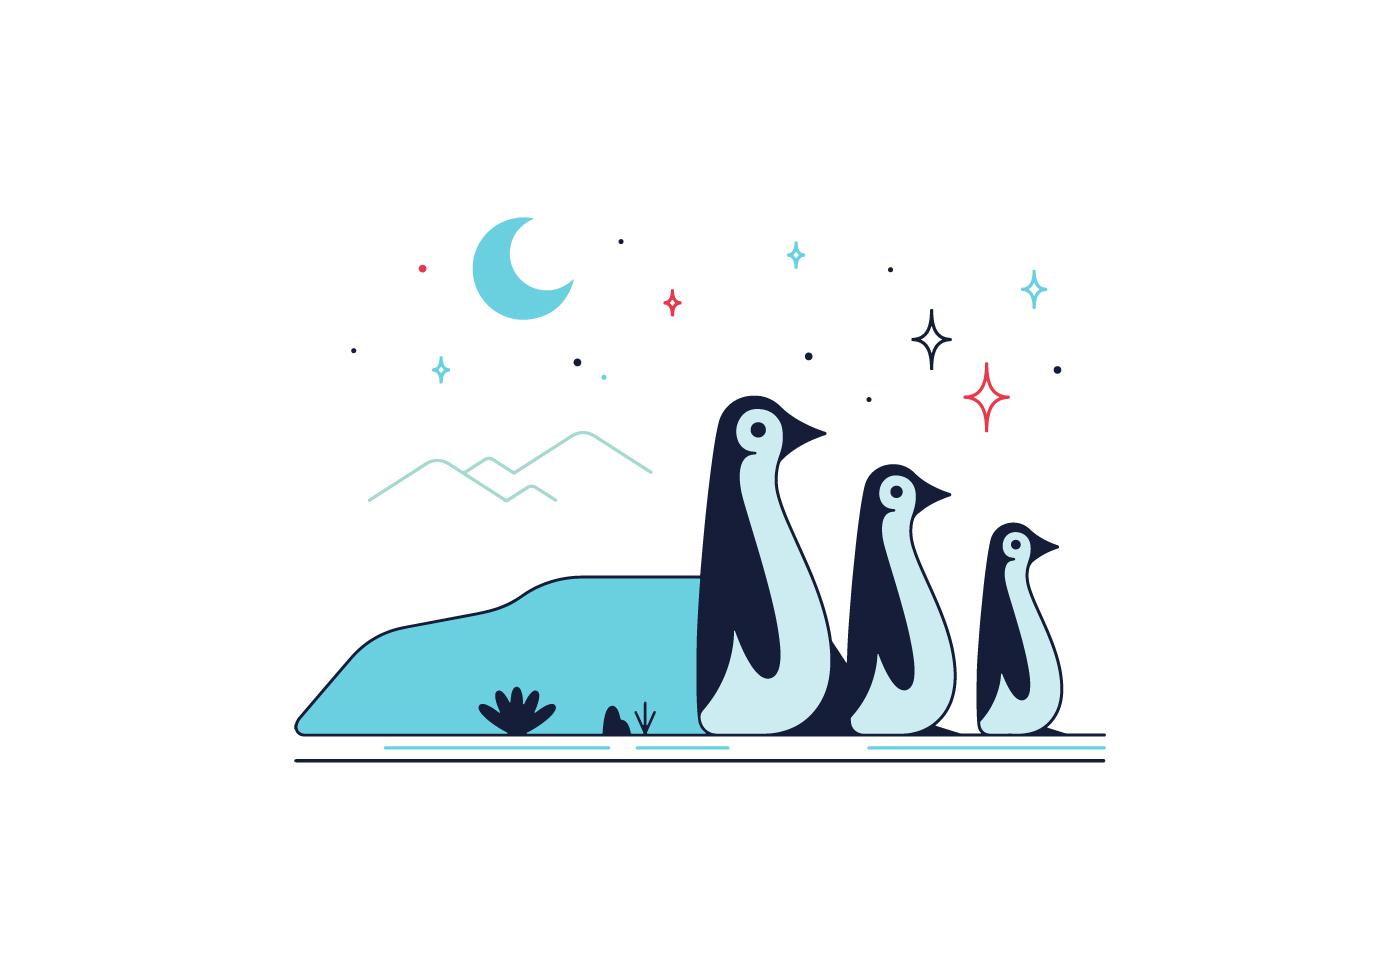 Cute Penguin Wallpaper Cartoon Free Penguins Vector Download Free Vector Art Stock